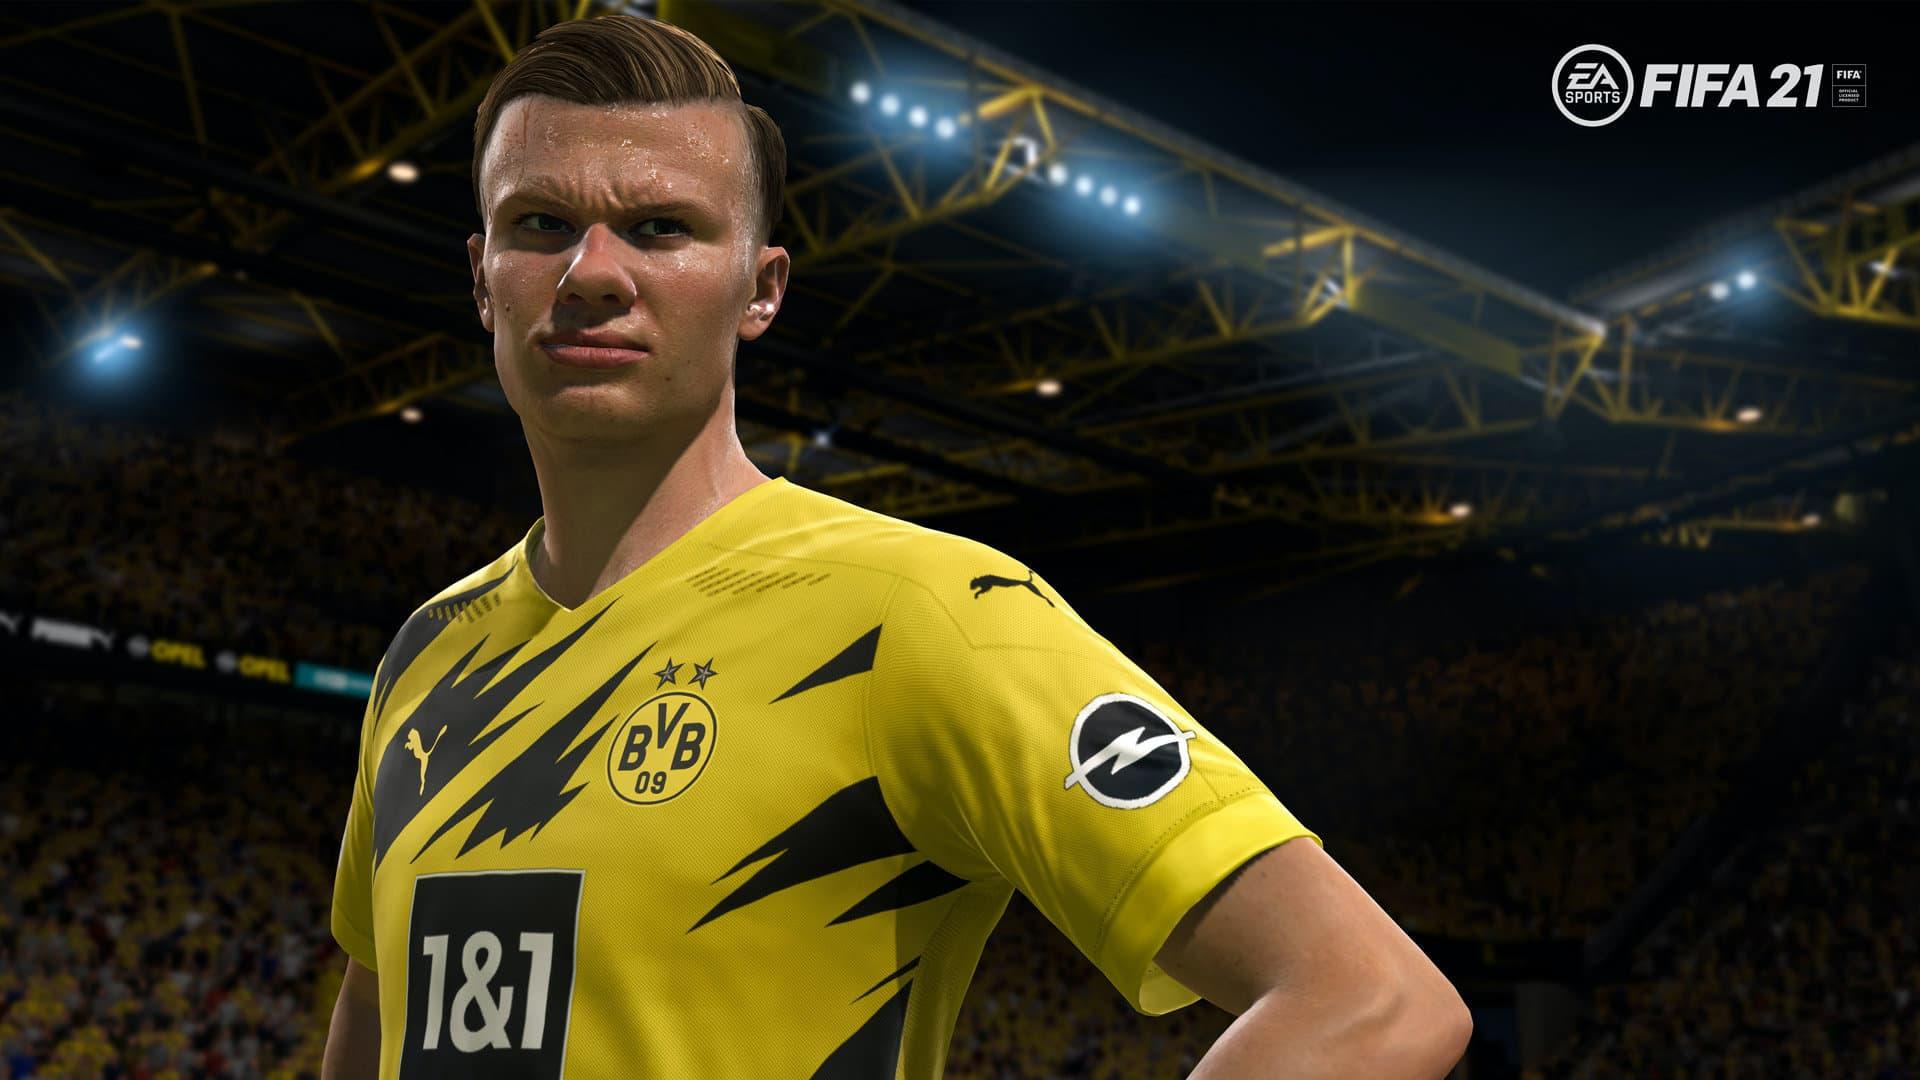 Fecha en la que FIFA 21 llegará a Xbox Game Pass